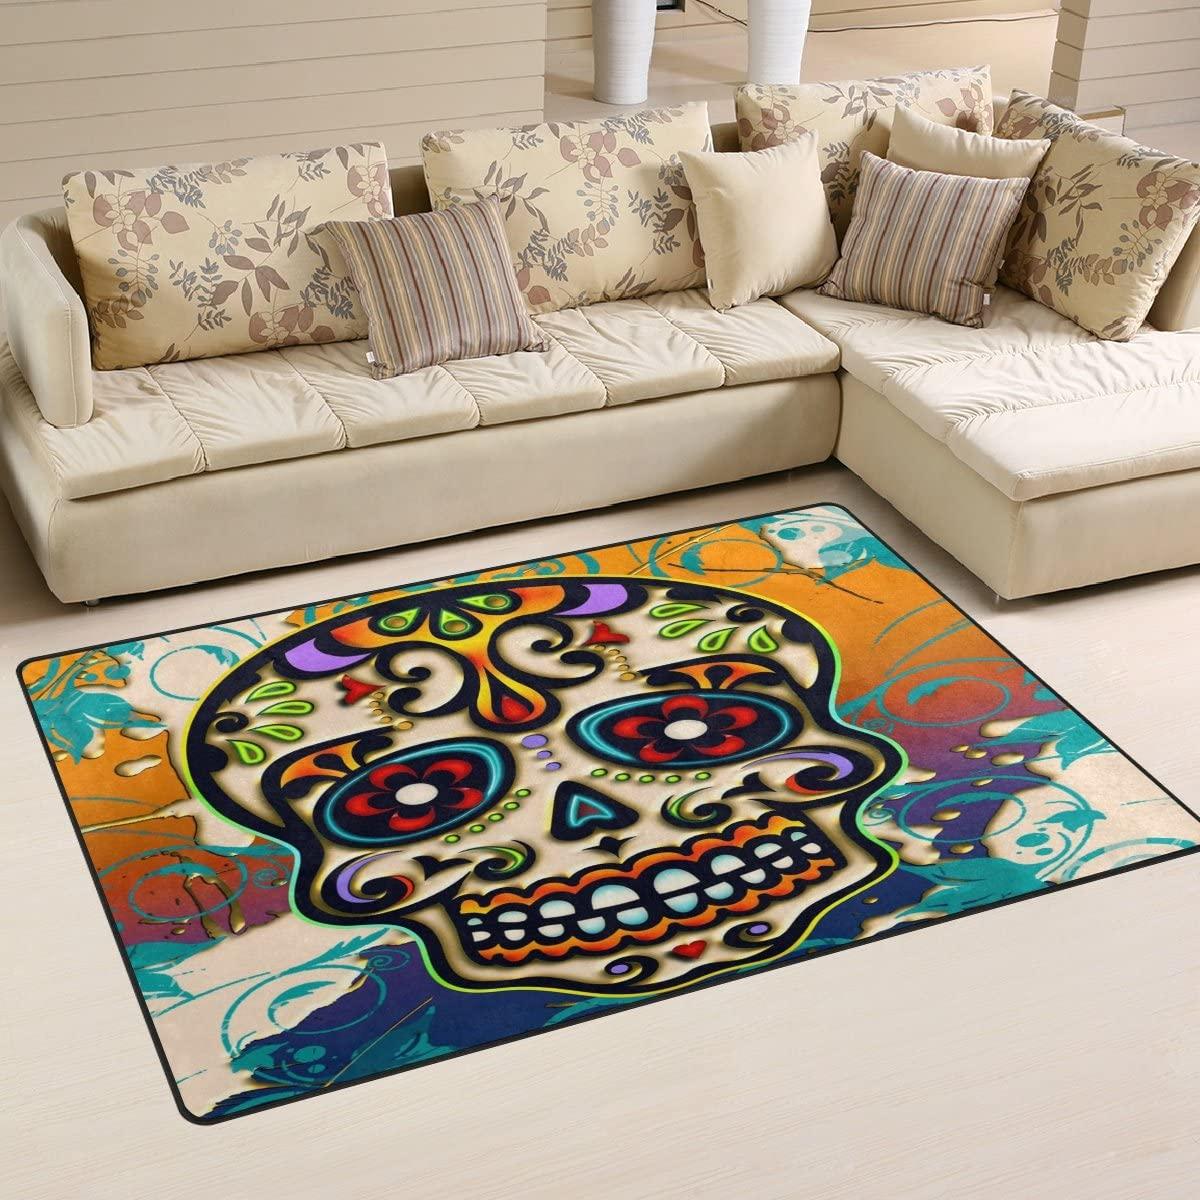 WOZO Dia De Los Muertos Sugar Skull Area Rug Rugs Non-Slip Floor Mat Doormats Living Dining Room Bedroom Dorm 60 x 39 inches inches Home Decor